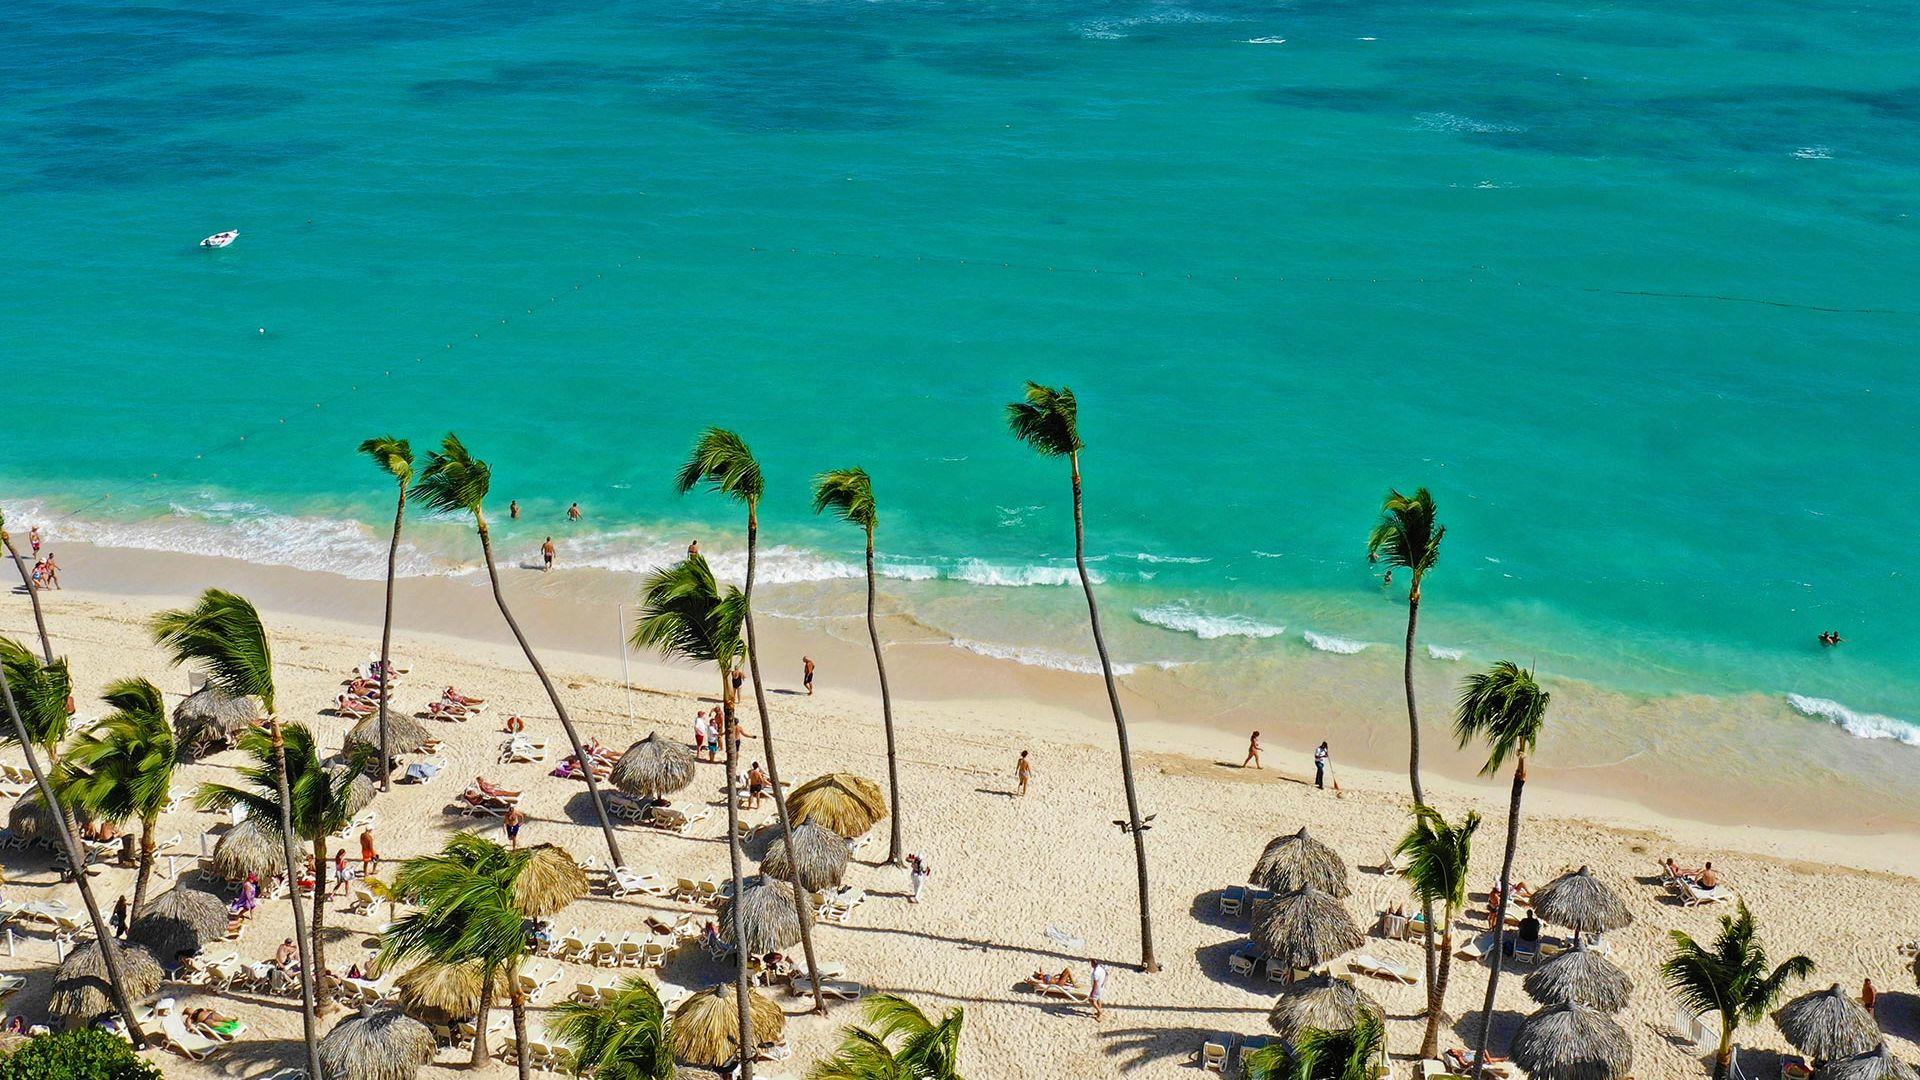 Craciun 2021 - Sejur charter Bahia Principe Resort Punta Cana, 9 zile